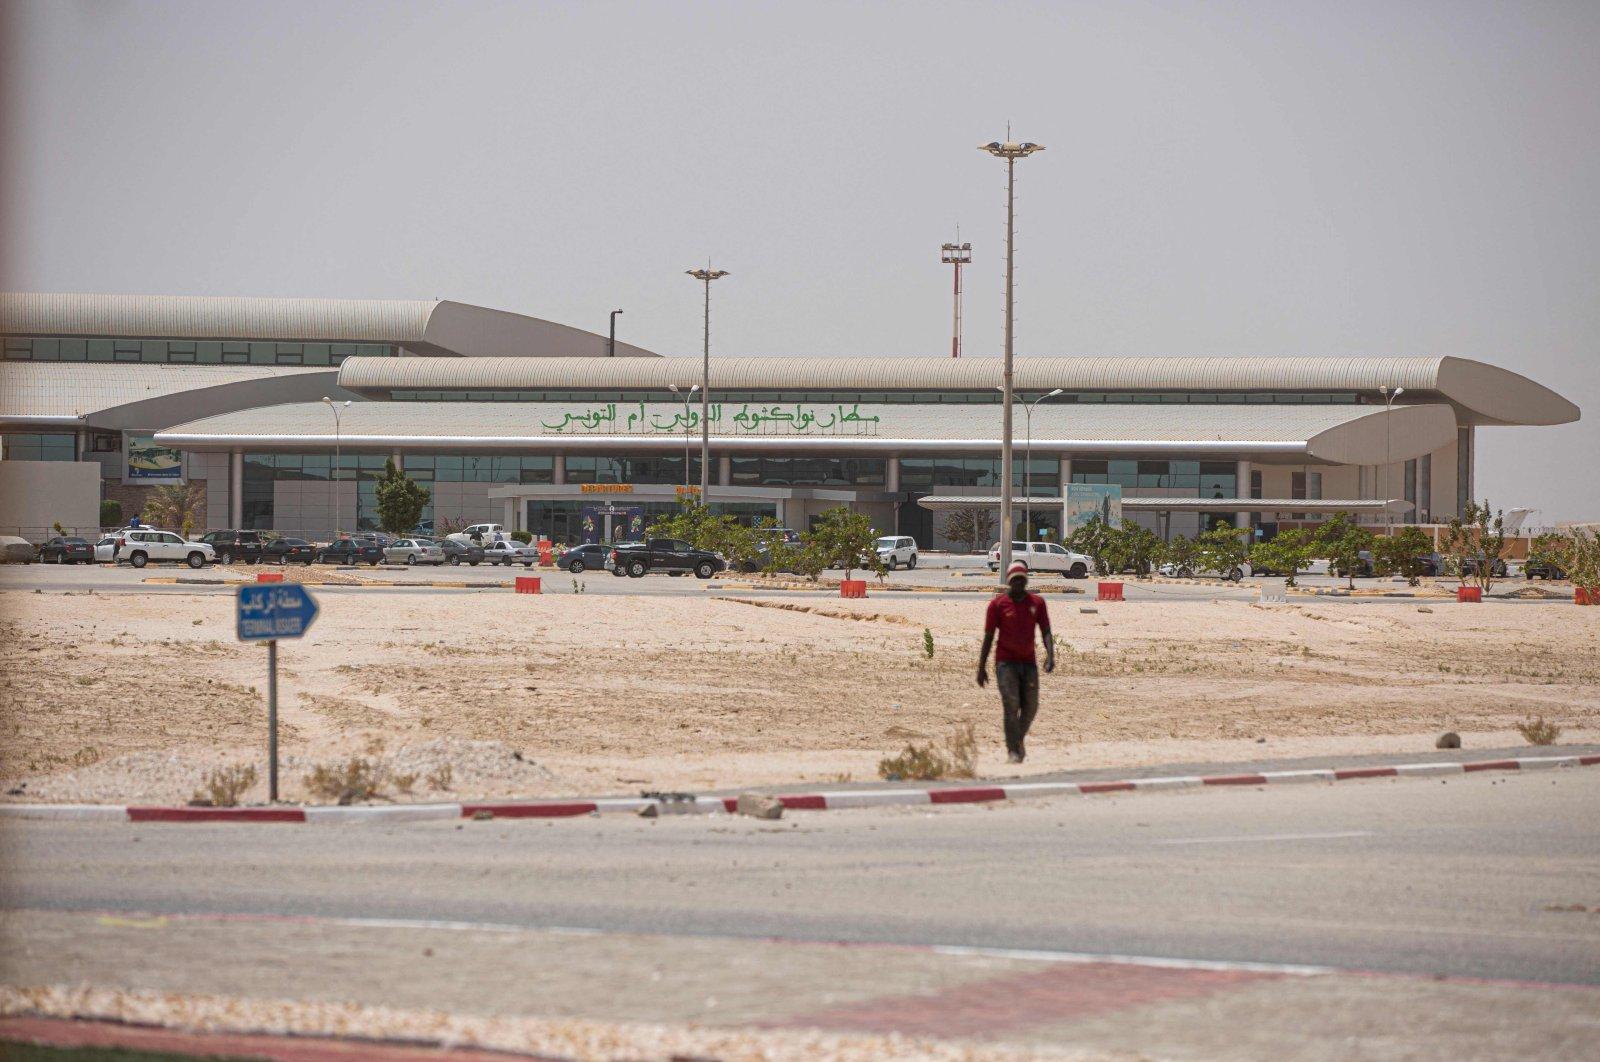 This general view shows the Nouakchott International Airport, Nouakchott, Mauritania, March 25, 2021. (AFP Photo)